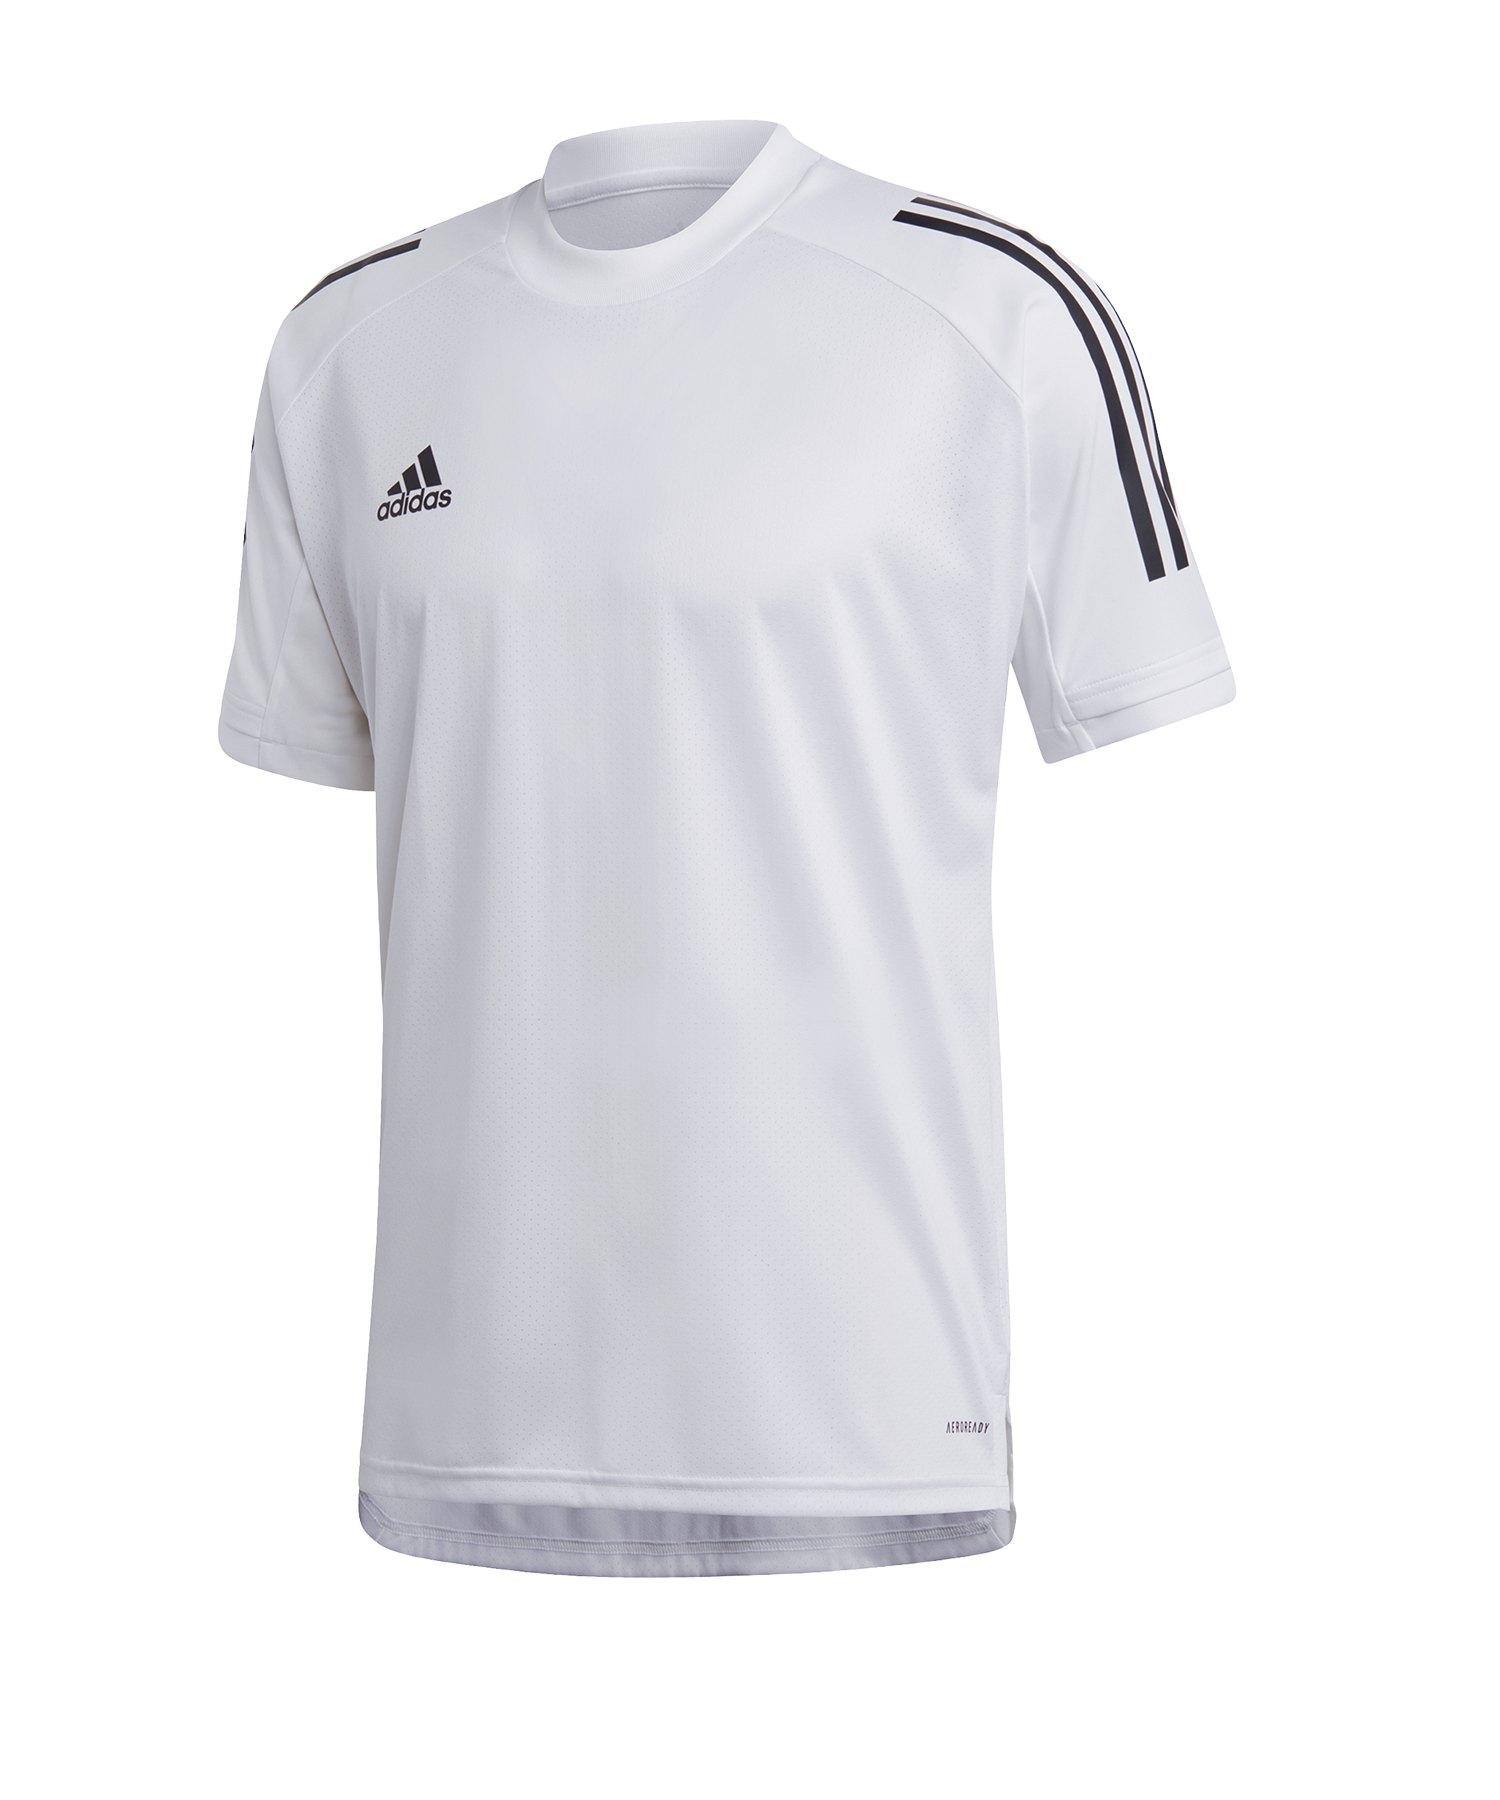 adidas Condivo 20 Trainingsshirt Weiss Schwarz - weiss